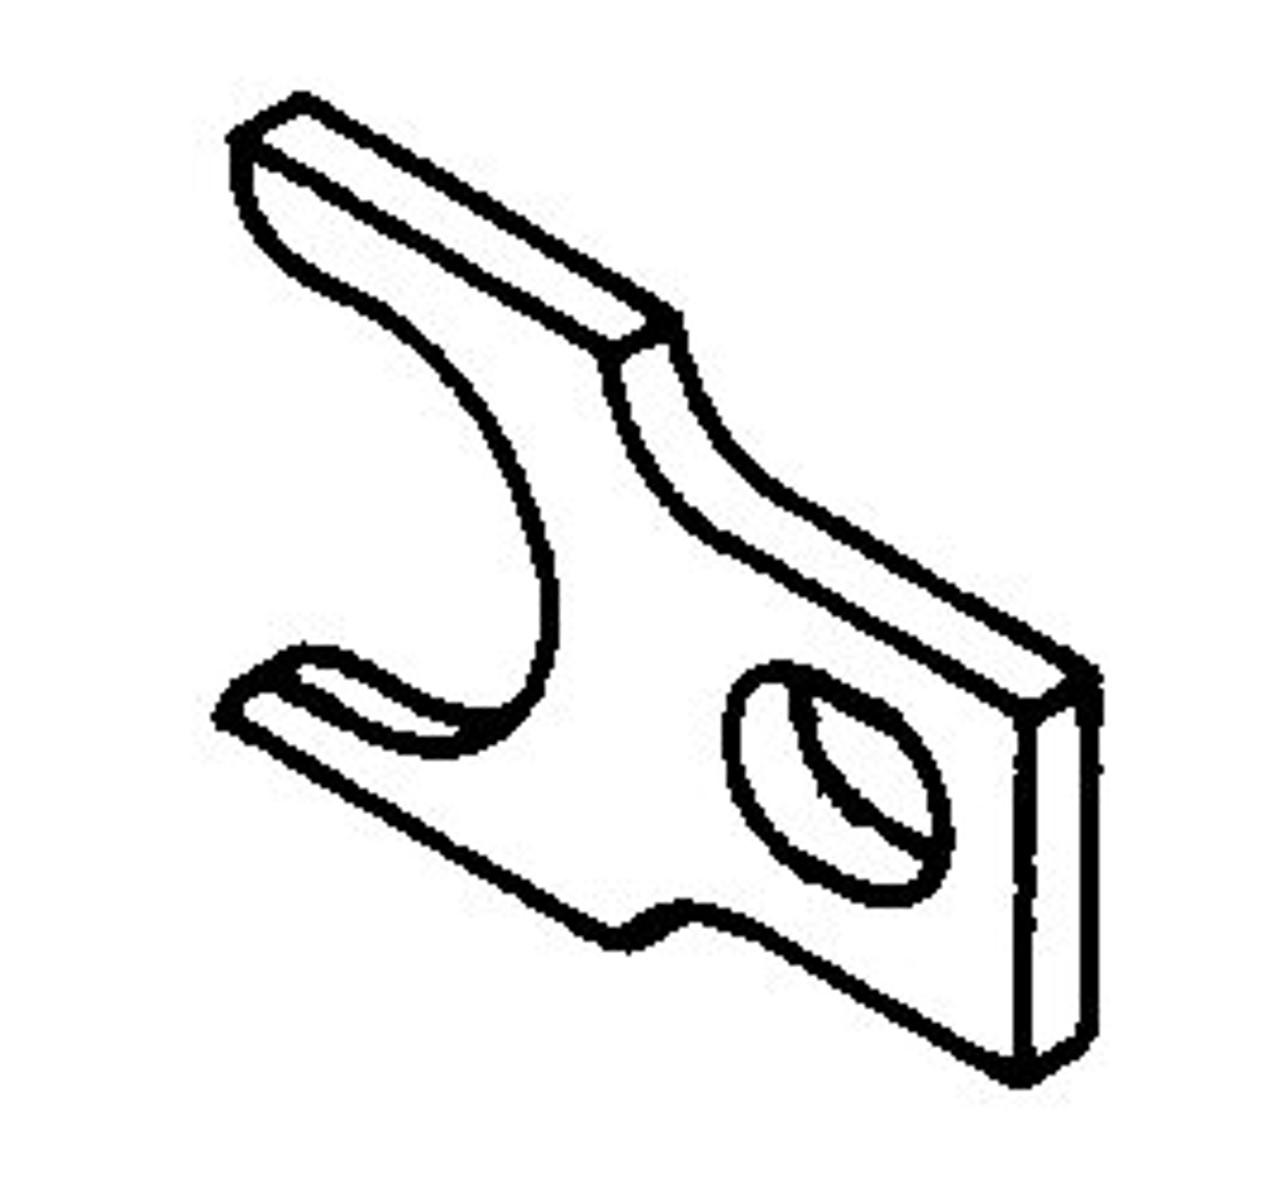 Butcher Boy B12,B14,B16 & SA16 - End Catch (Gauge Arm Support) - BB007-68